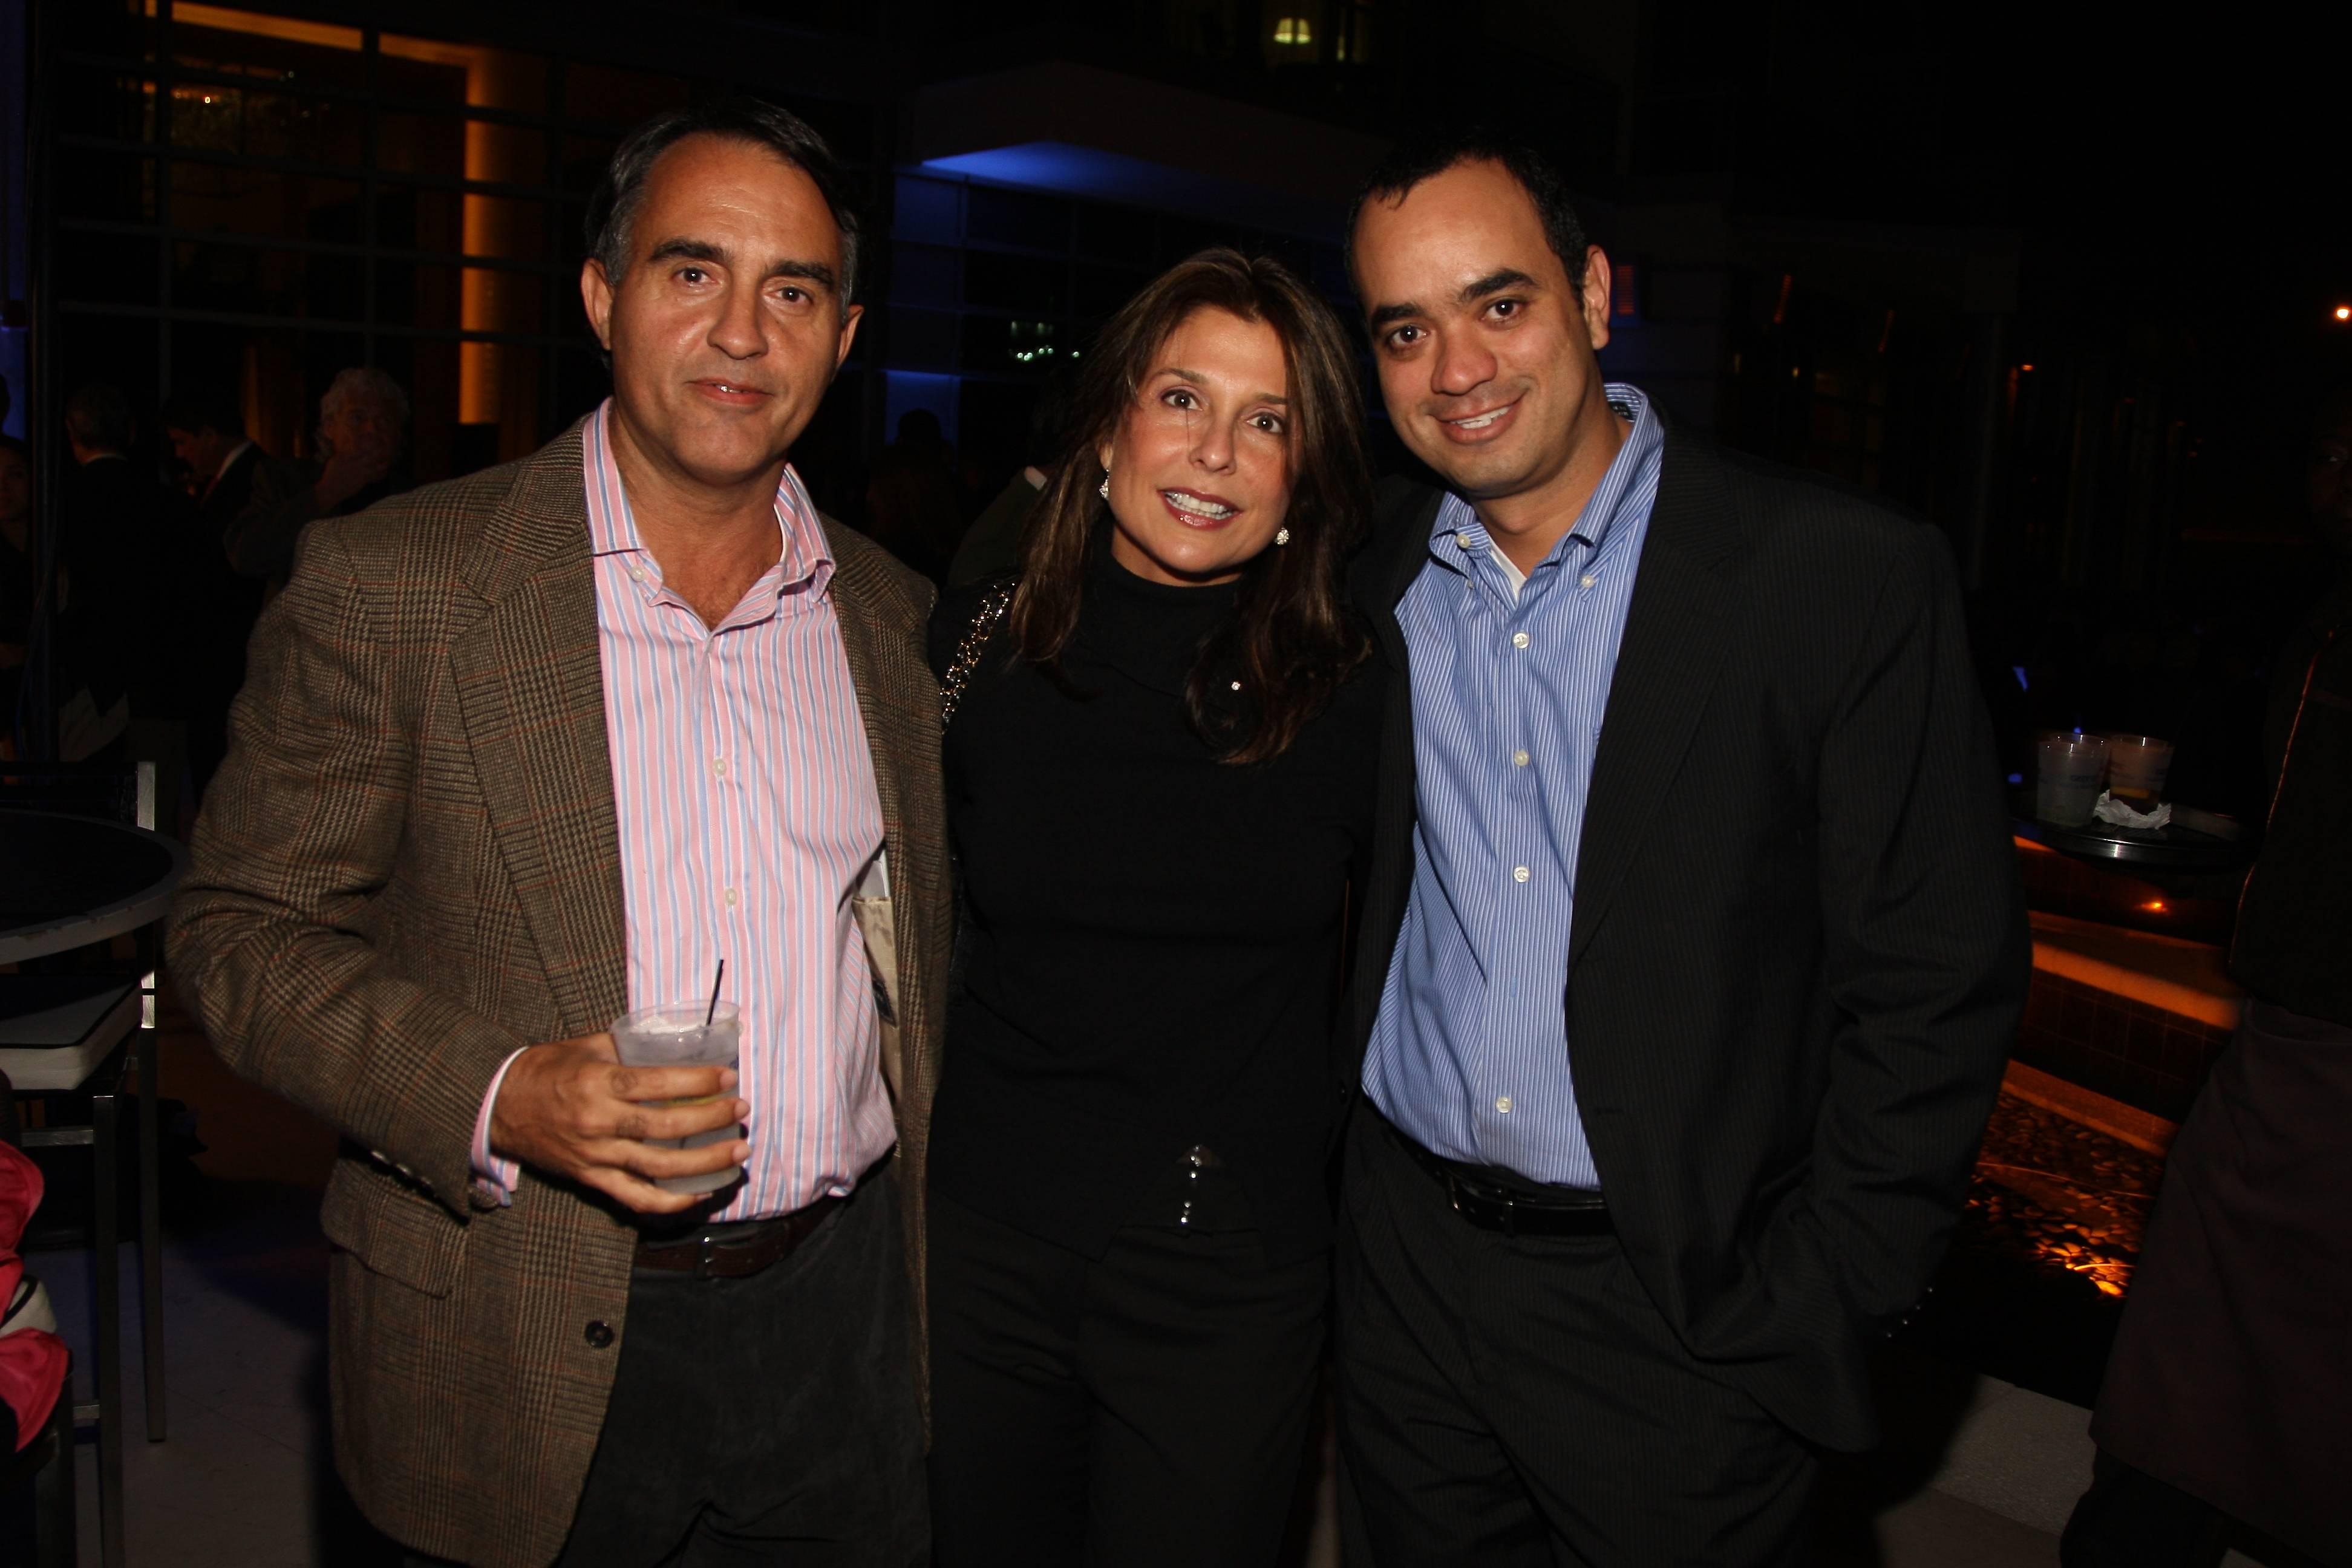 Javier Valle, Ingrid Grad, Robert Allegria